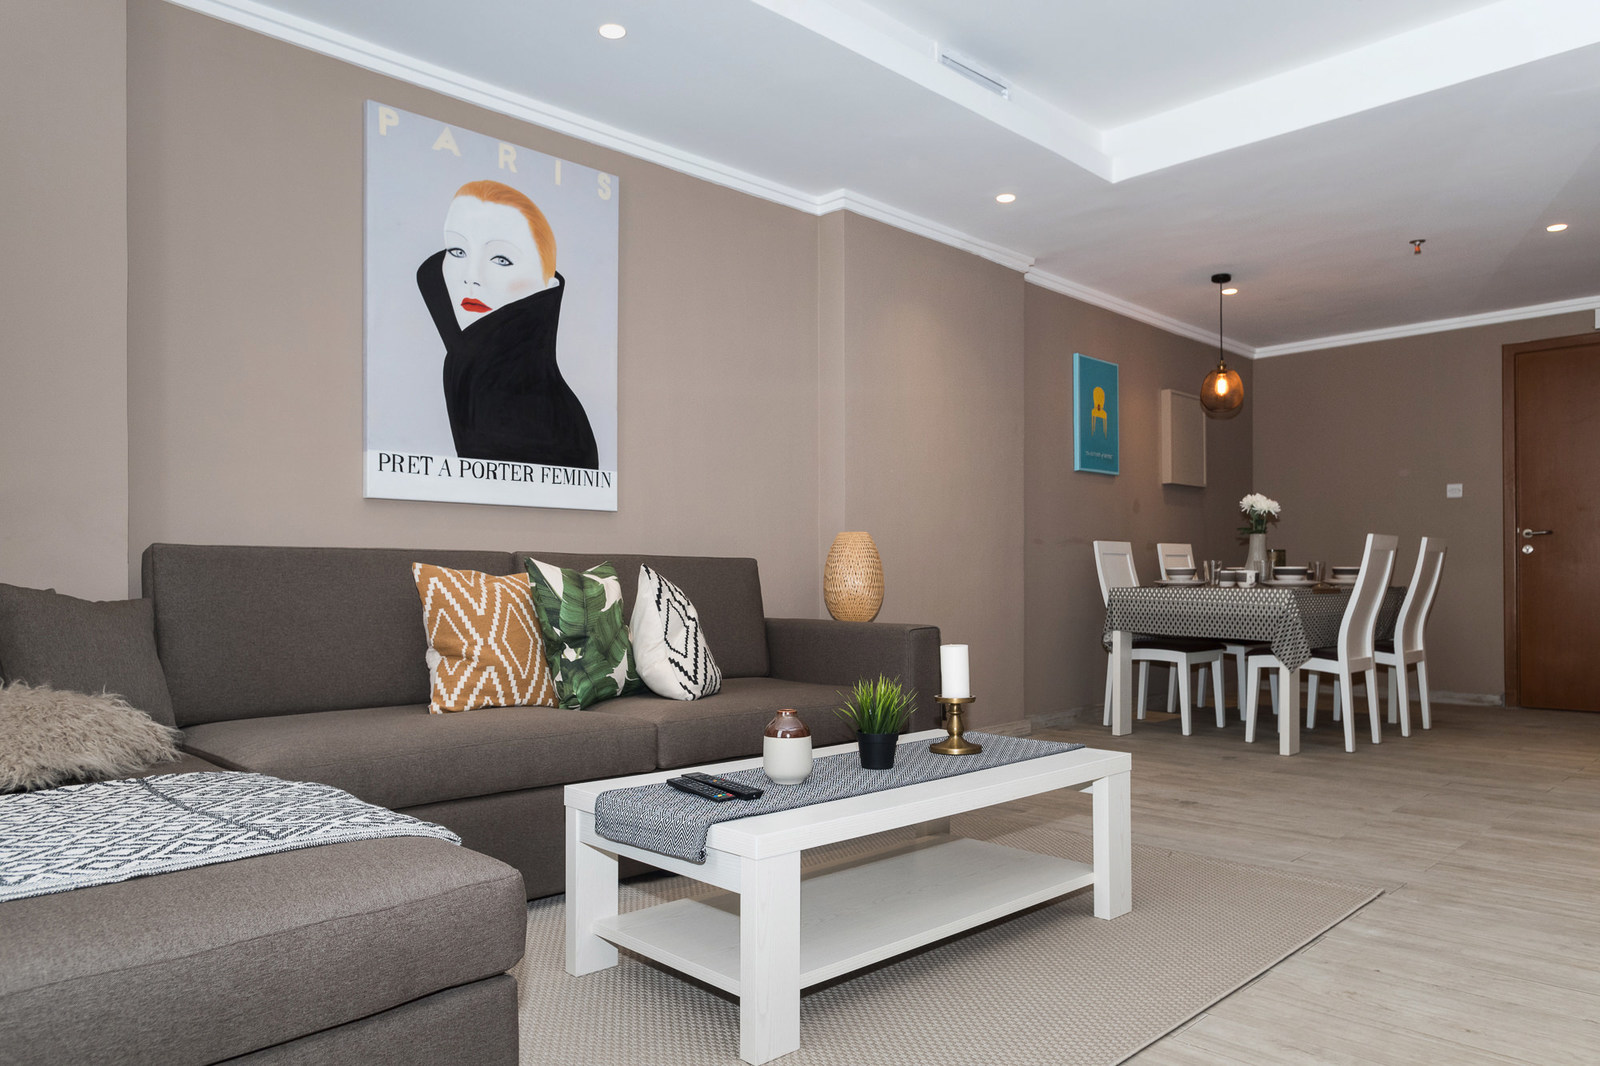 Bneid Al Gar – great, furnished, three bedroom apartments w/facilities